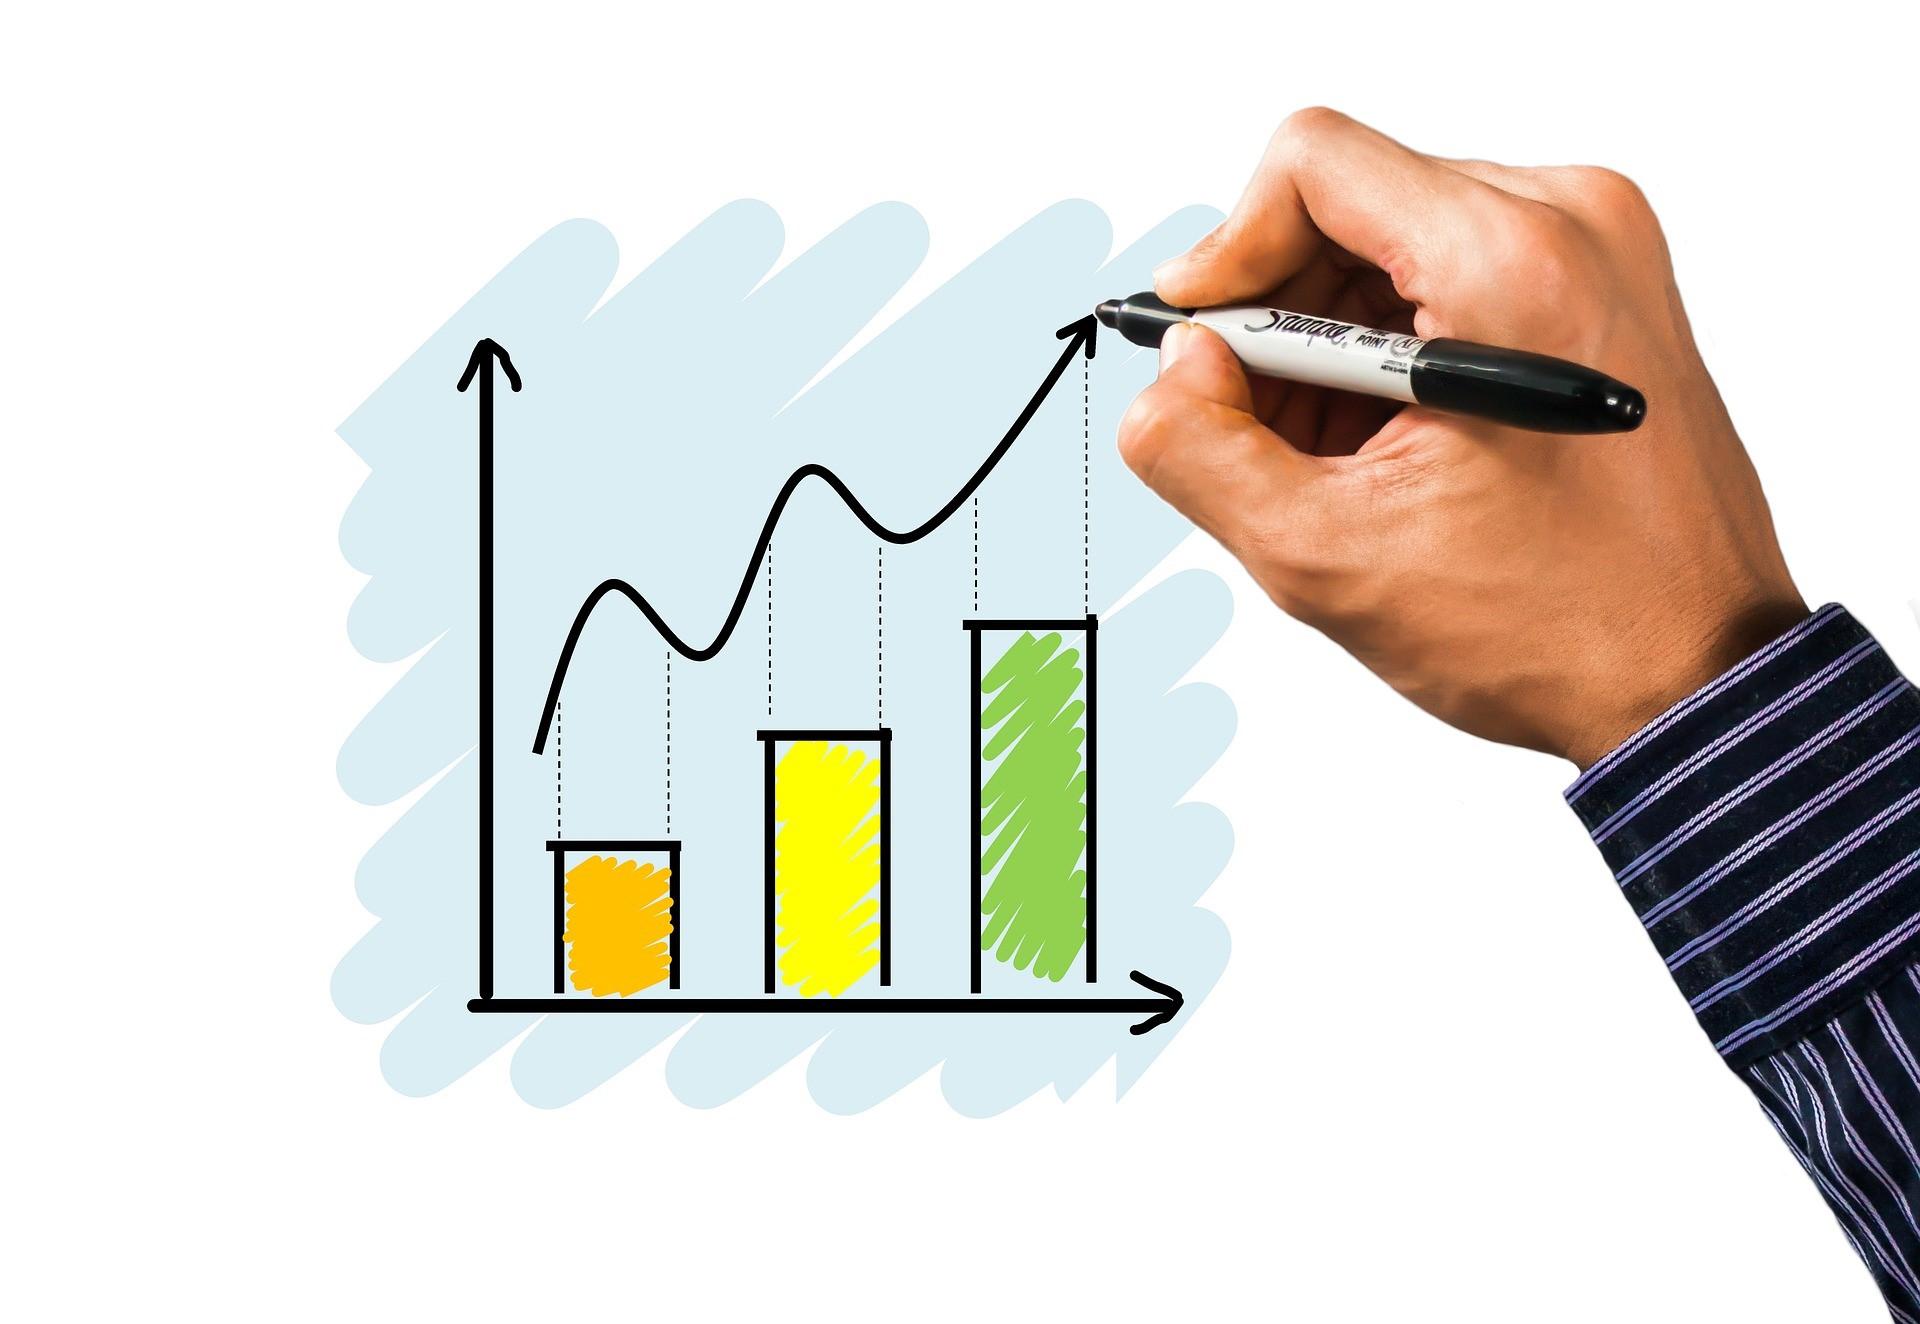 Coditation-Website-Revenue-growth-blog-4